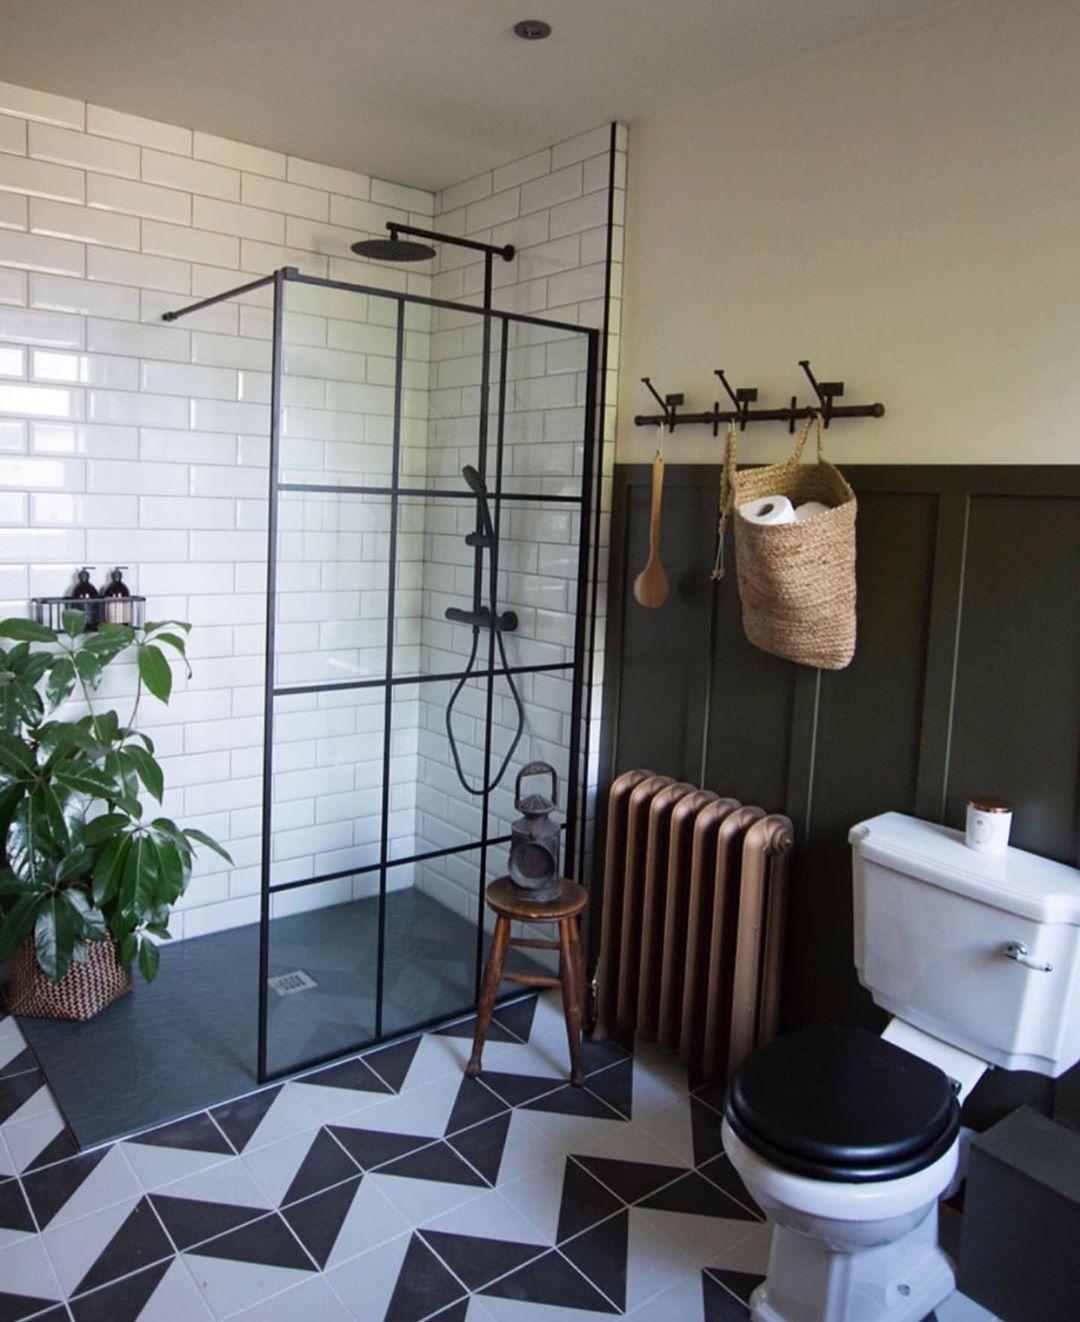 Bathroom with black and white chevron